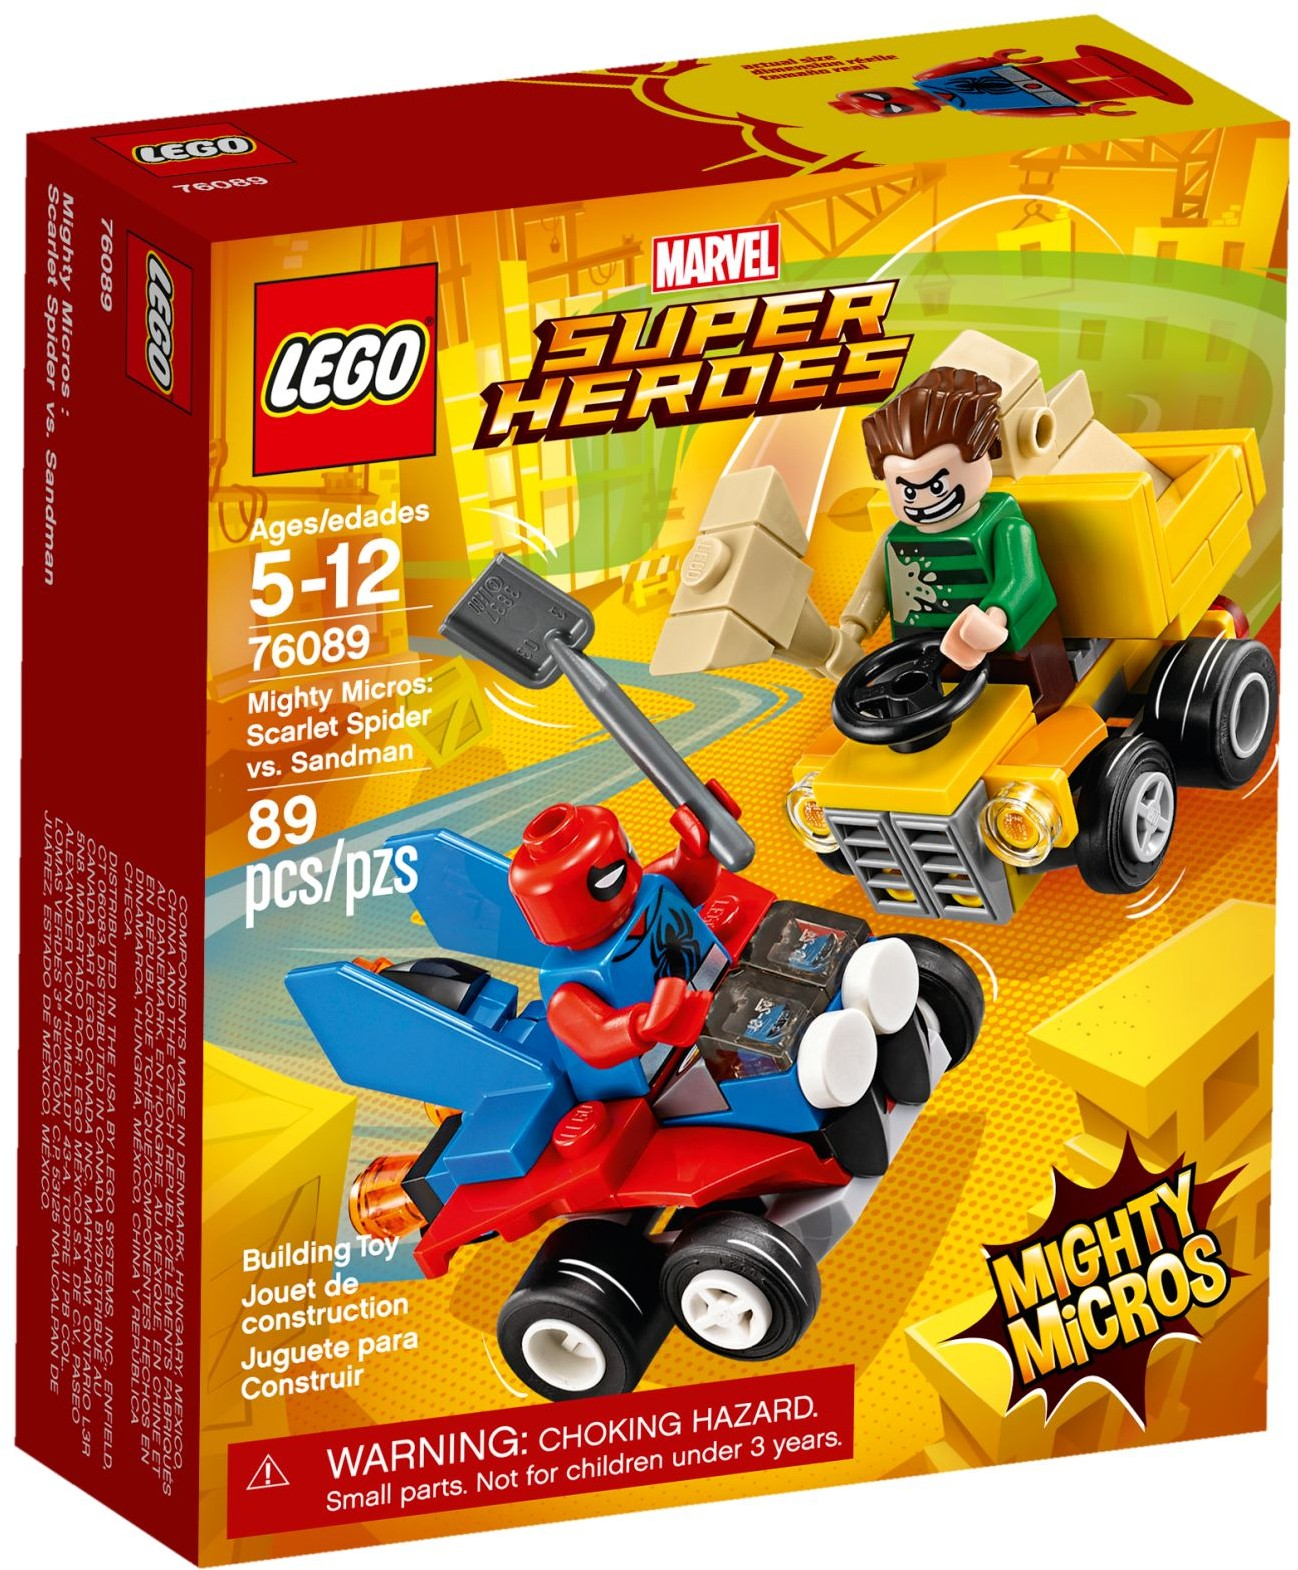 Sandman New Marvel Super Heroes Scarlet Spider vs Lego 76089 Mighty Micros